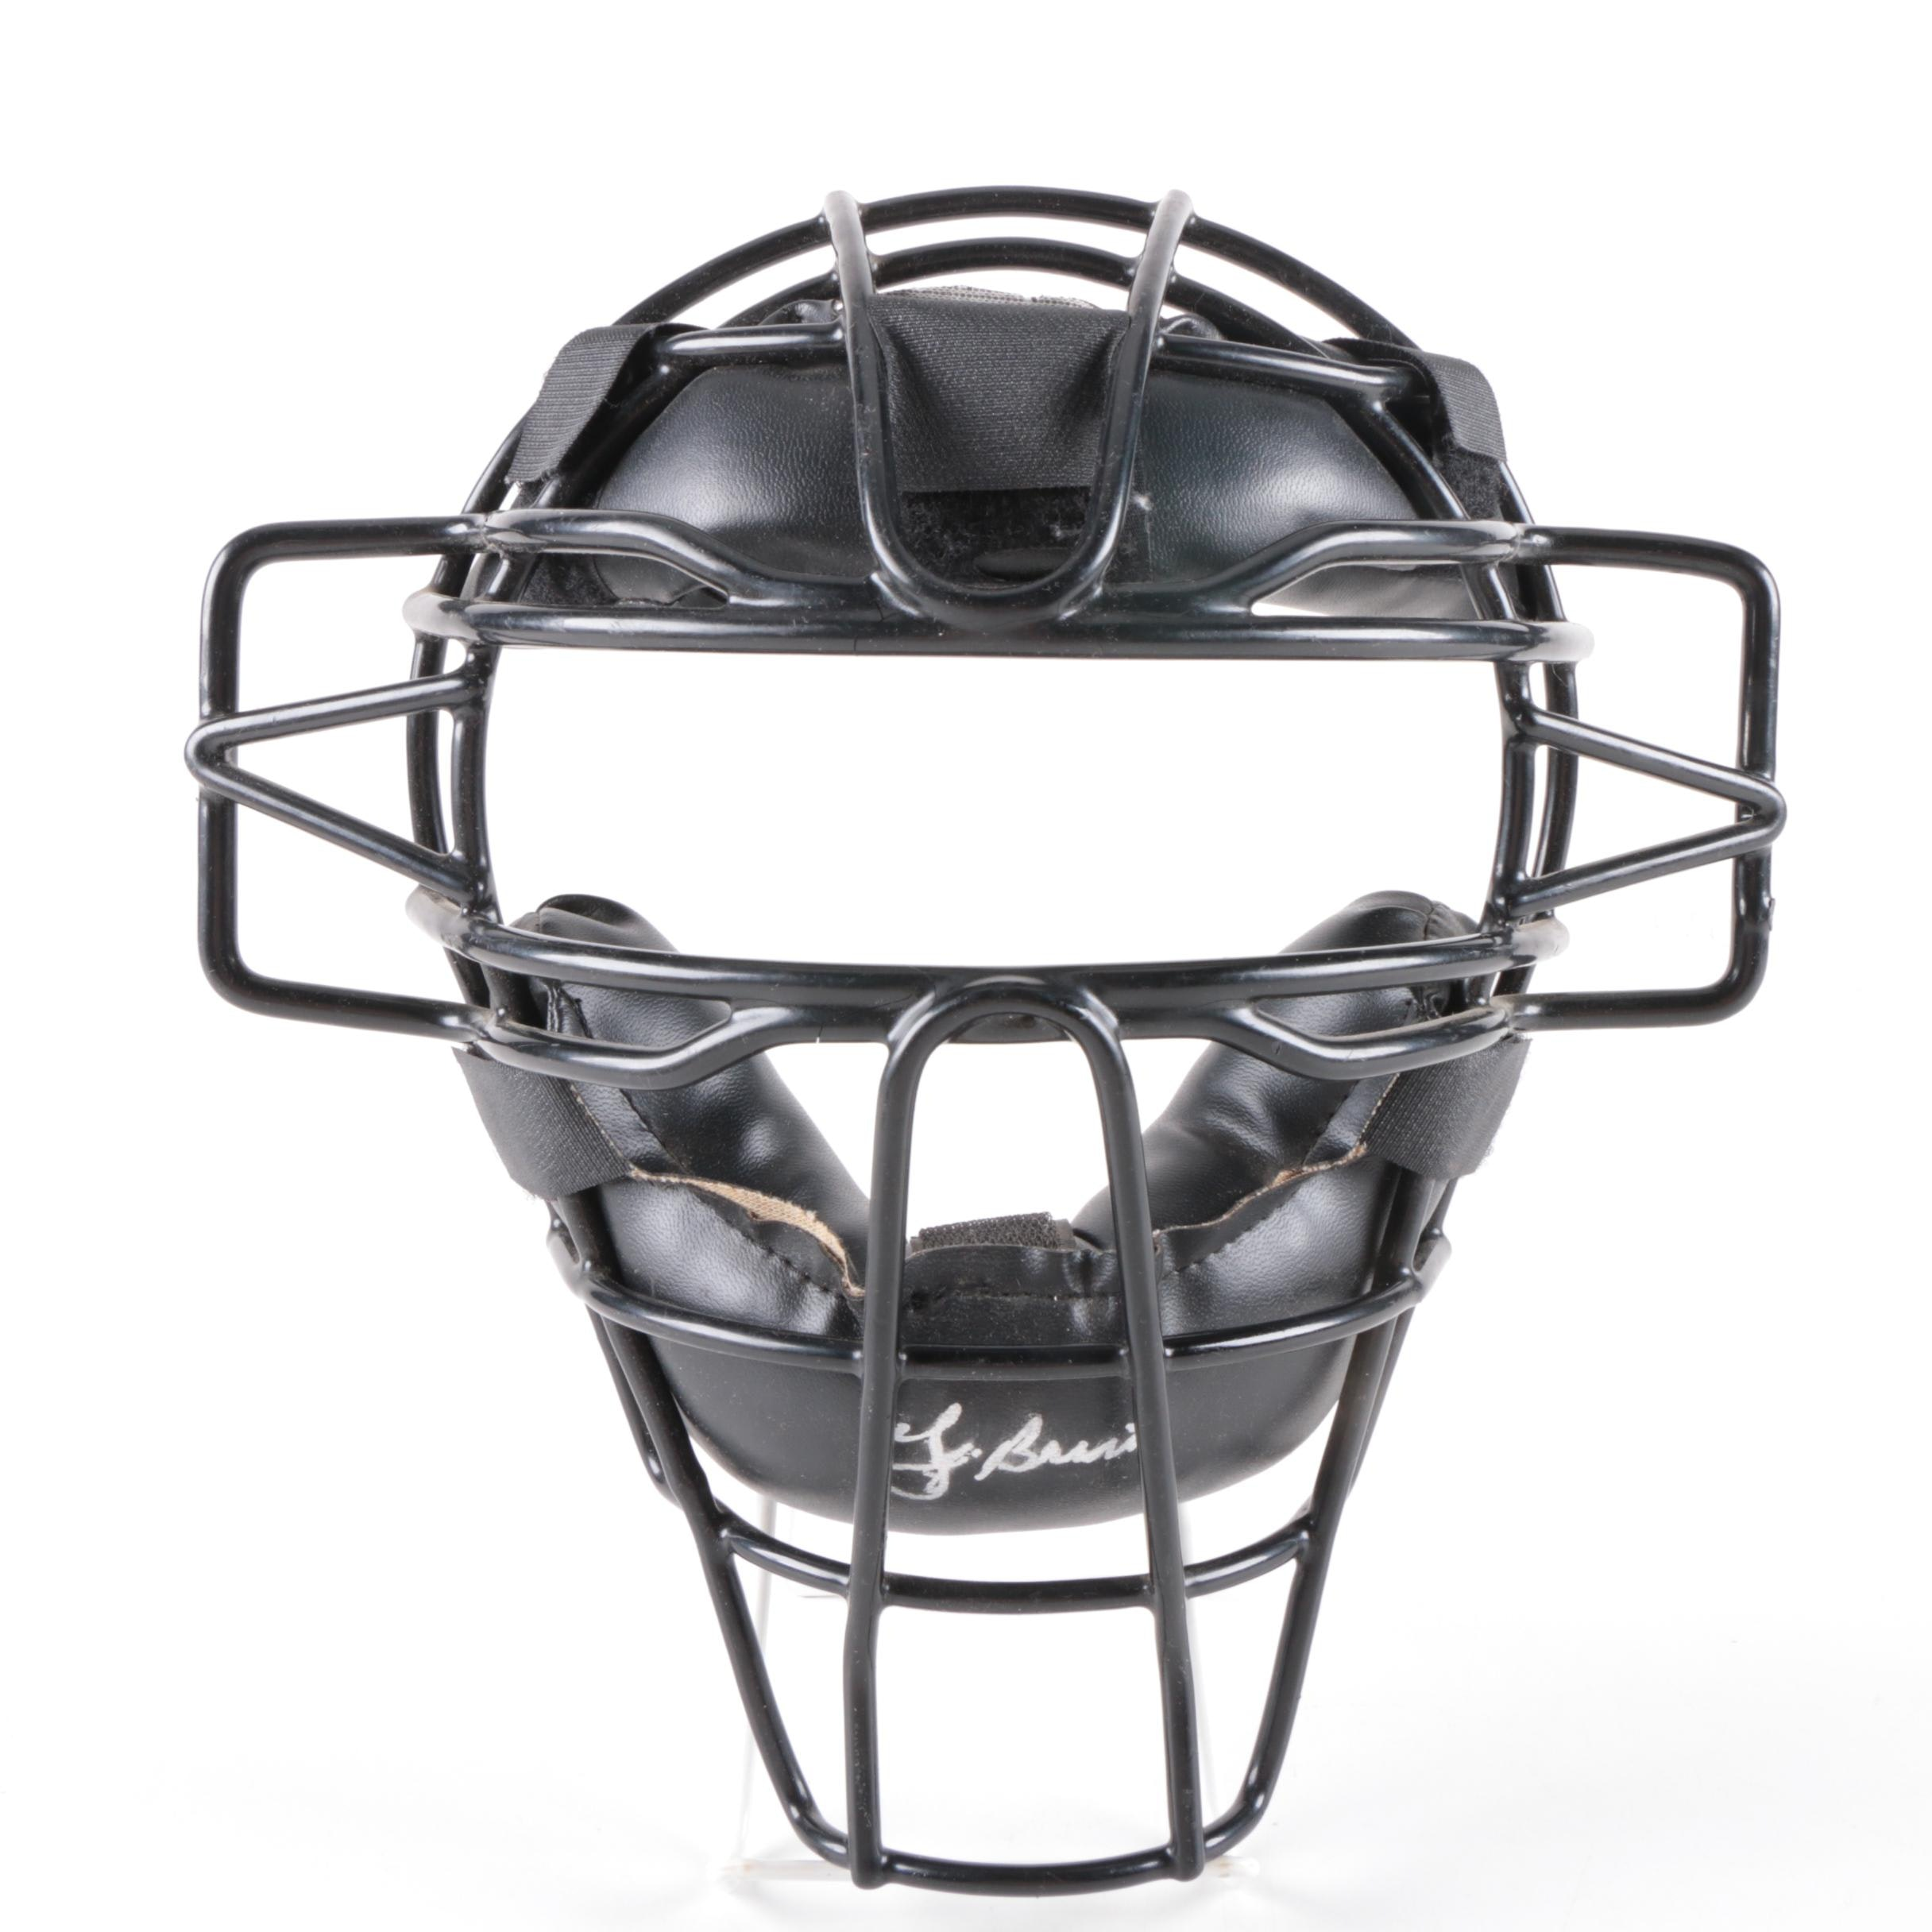 Yogi Berra Autographed Pro Custom Catcher's Mask